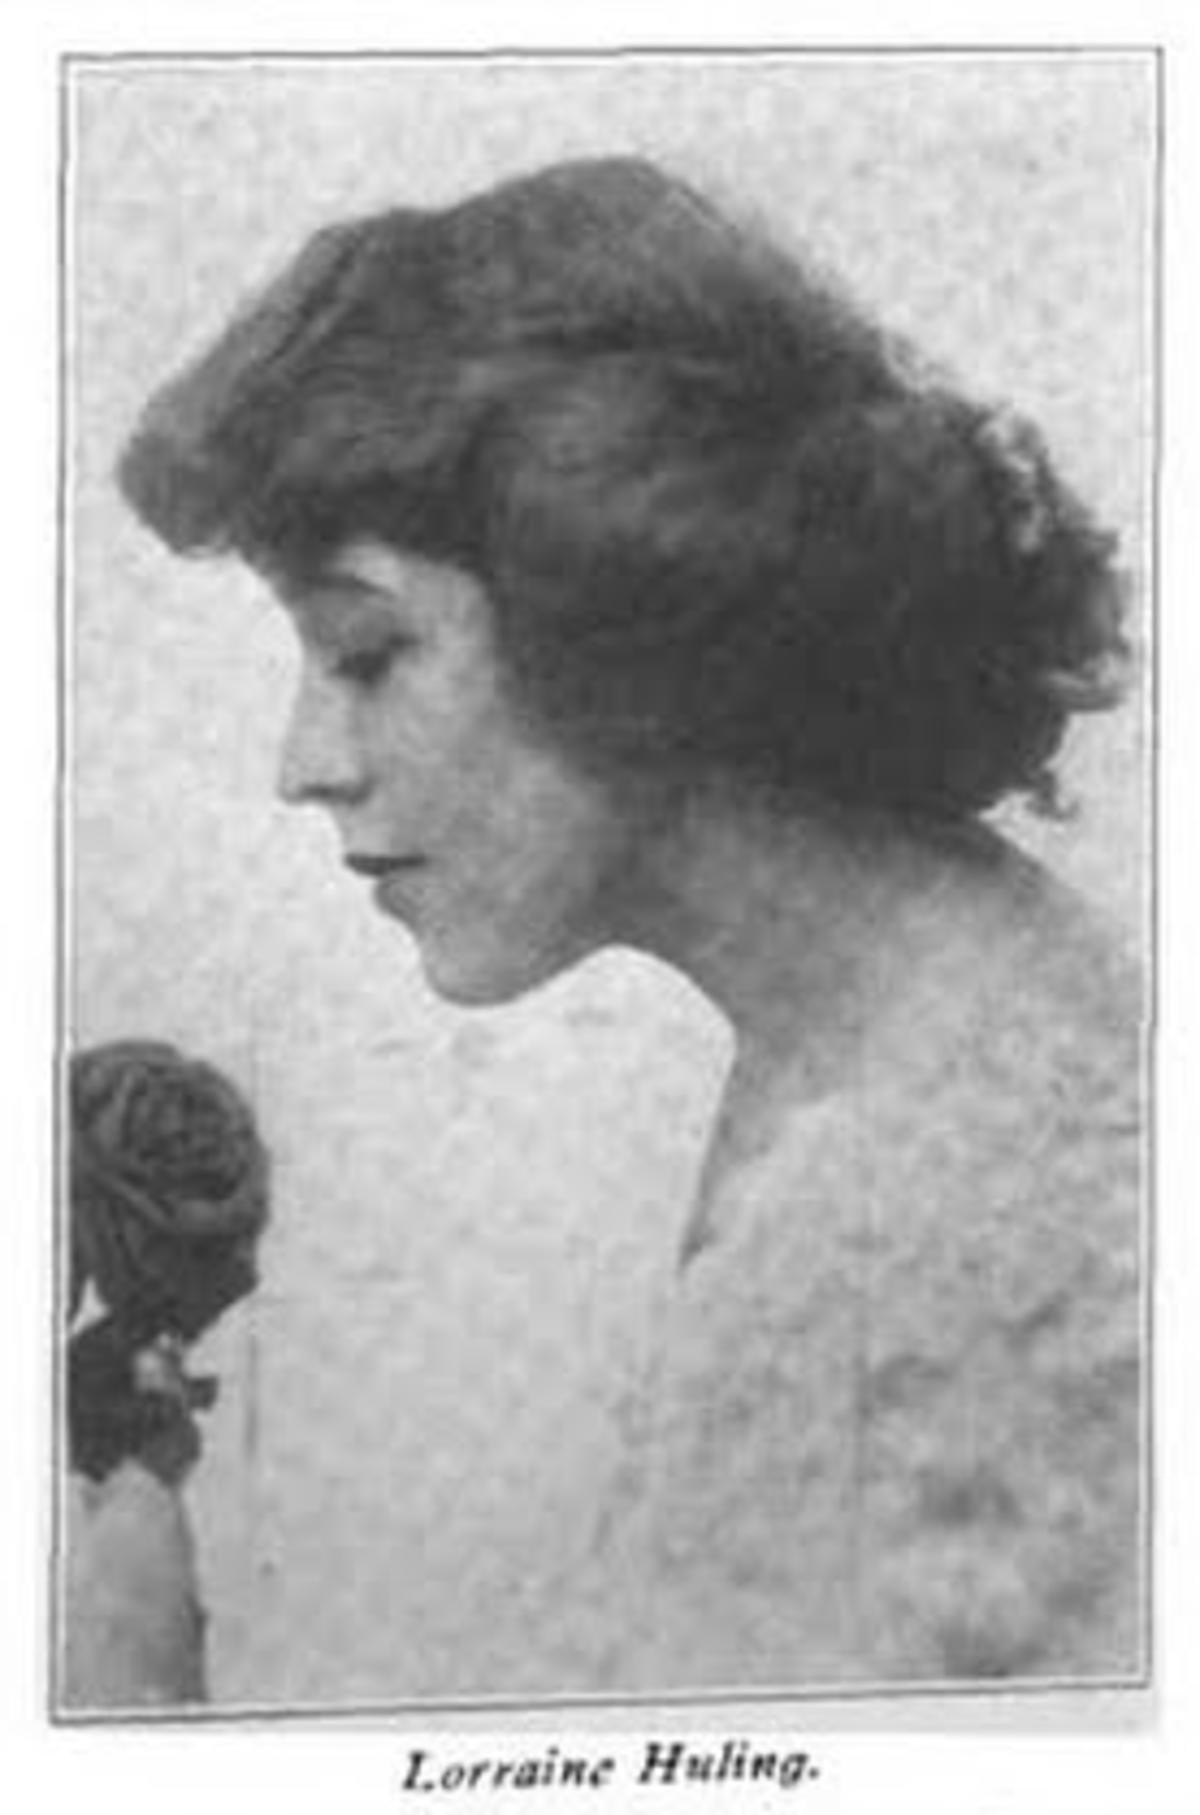 Lorraine Huling Maynard